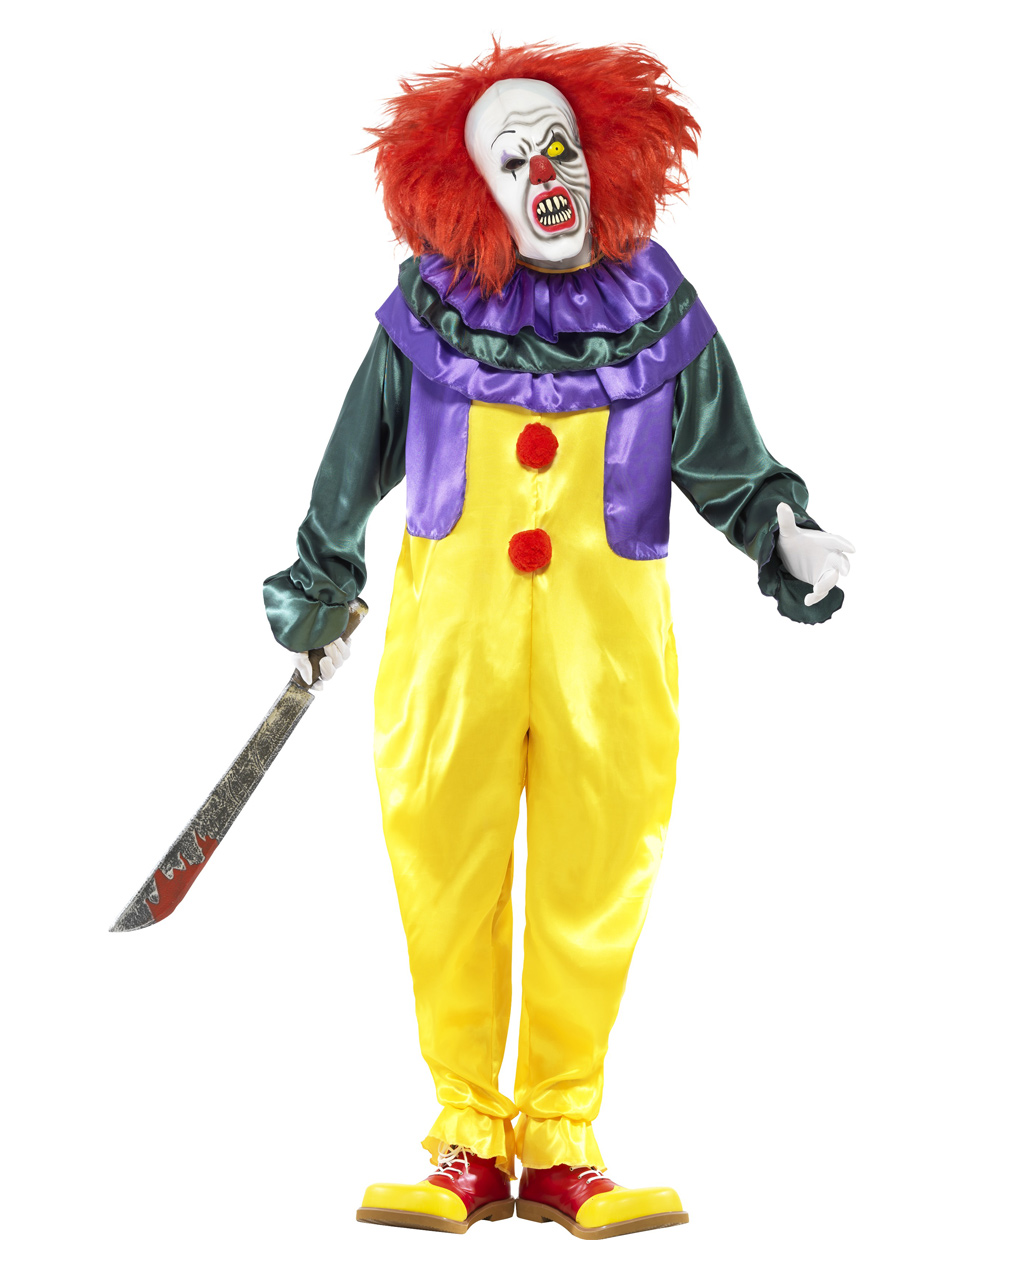 Classic Horror Clown Kostum Mit Maske Fur Halloween Horror Shop Com